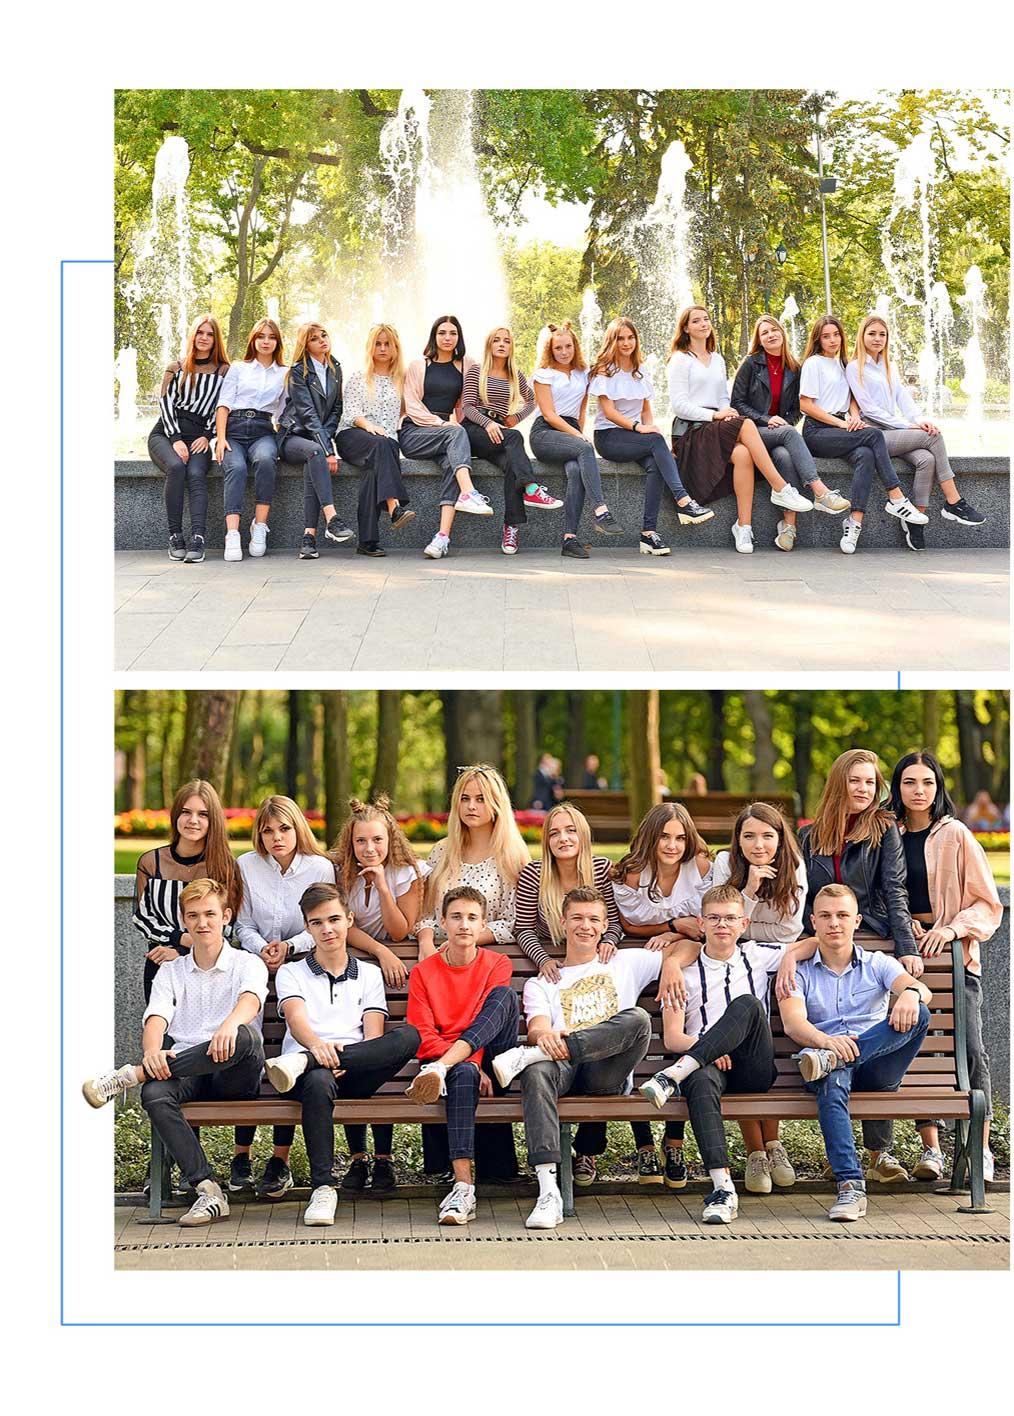 https://school-photo.com.ua/wp-content/uploads/2021/09/13_03.jpg